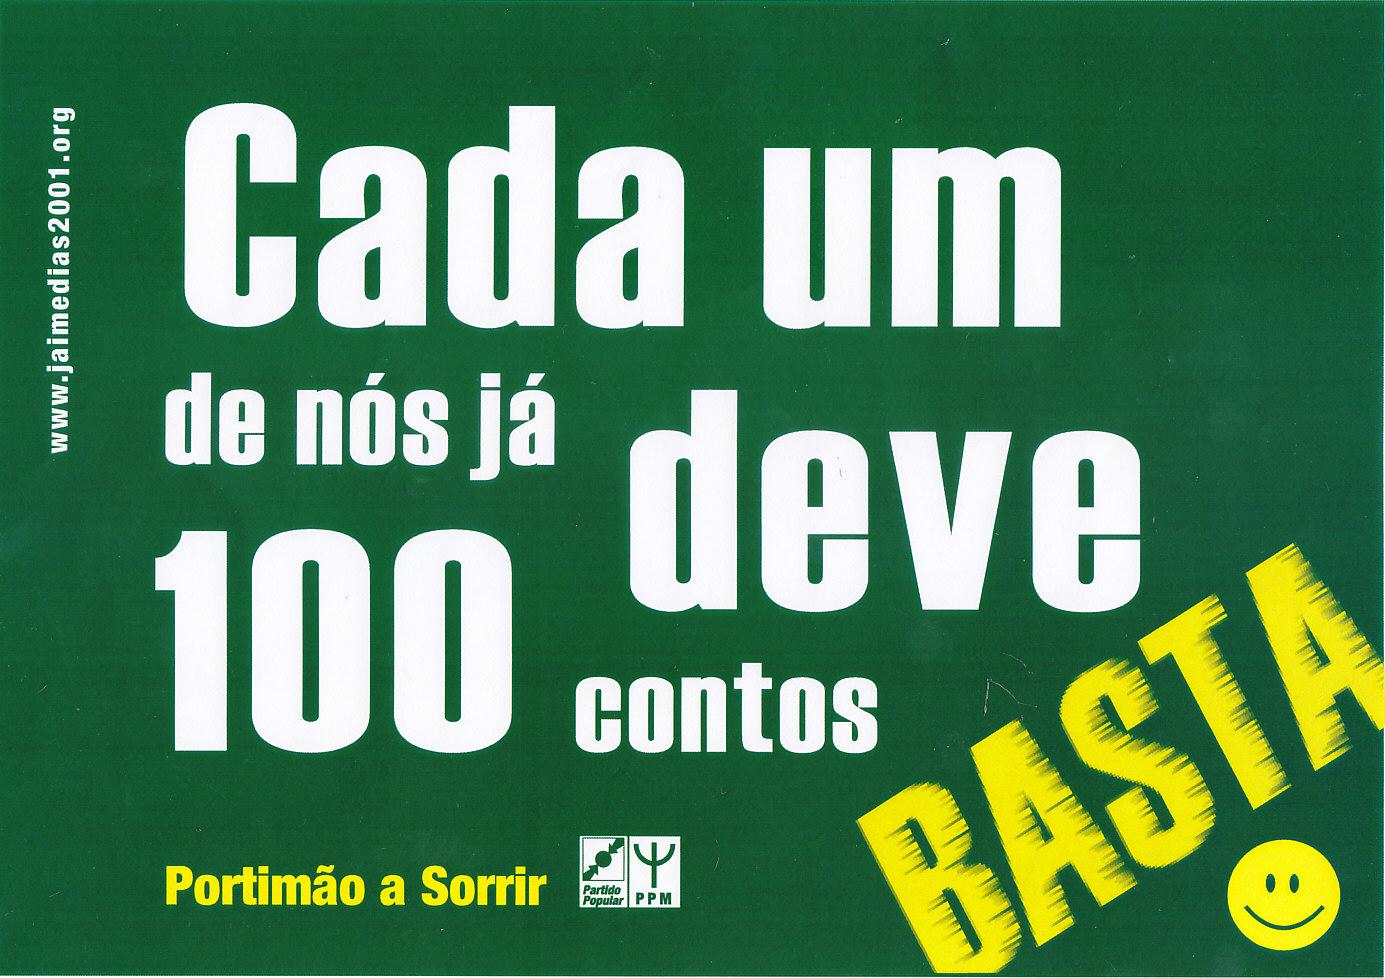 Jaime_Dias_maquete_outdoor_2001_0004